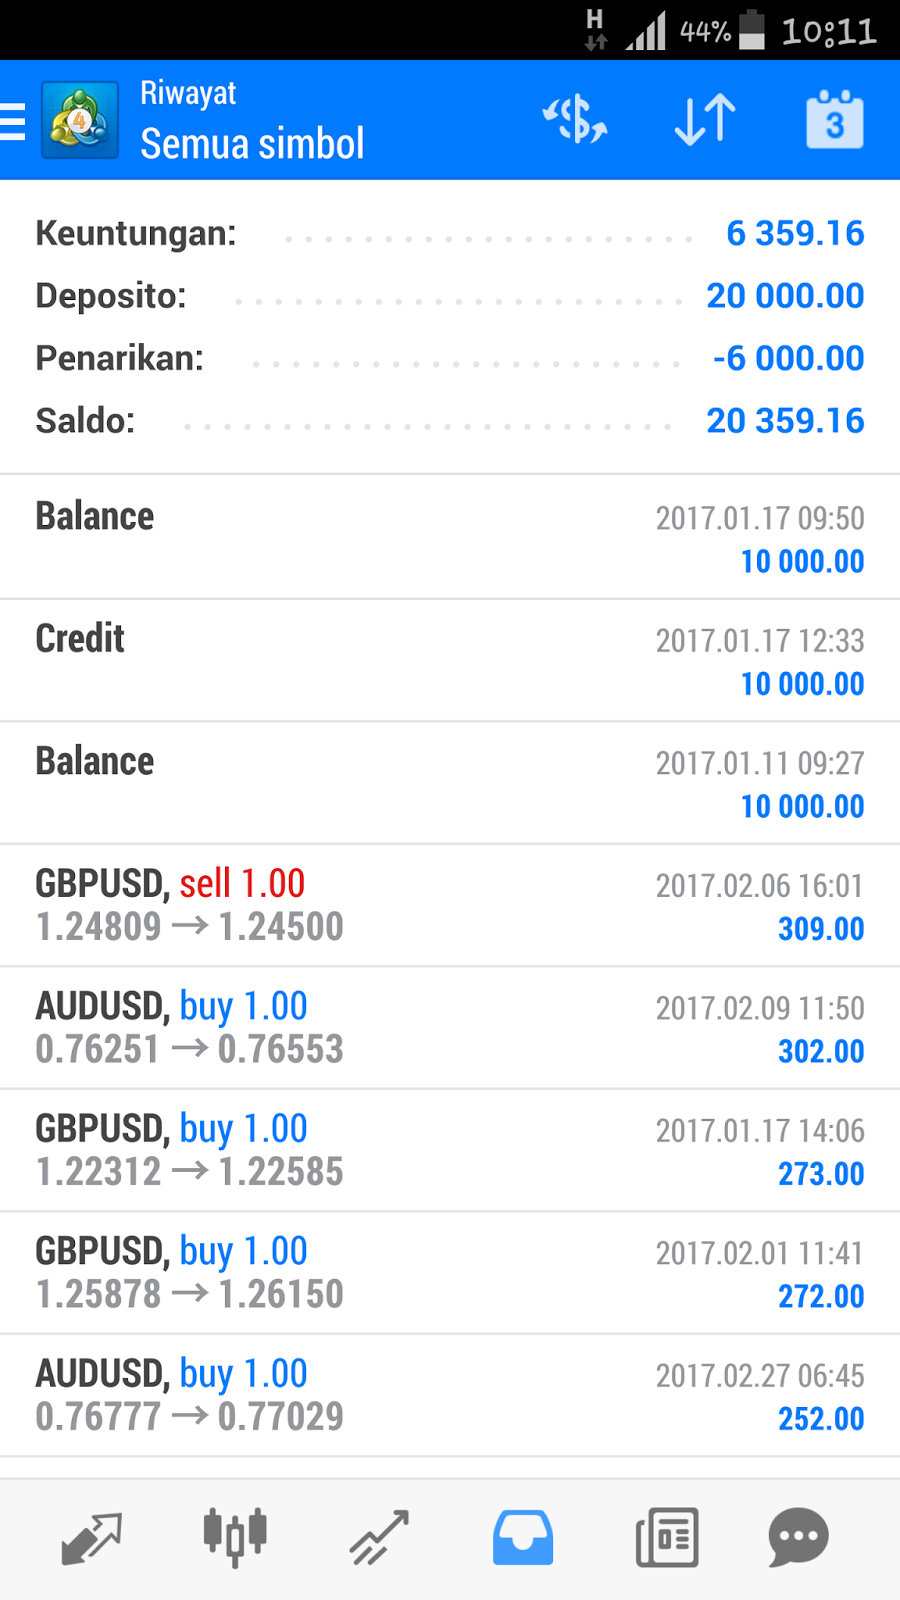 Nsis uninstall options trading